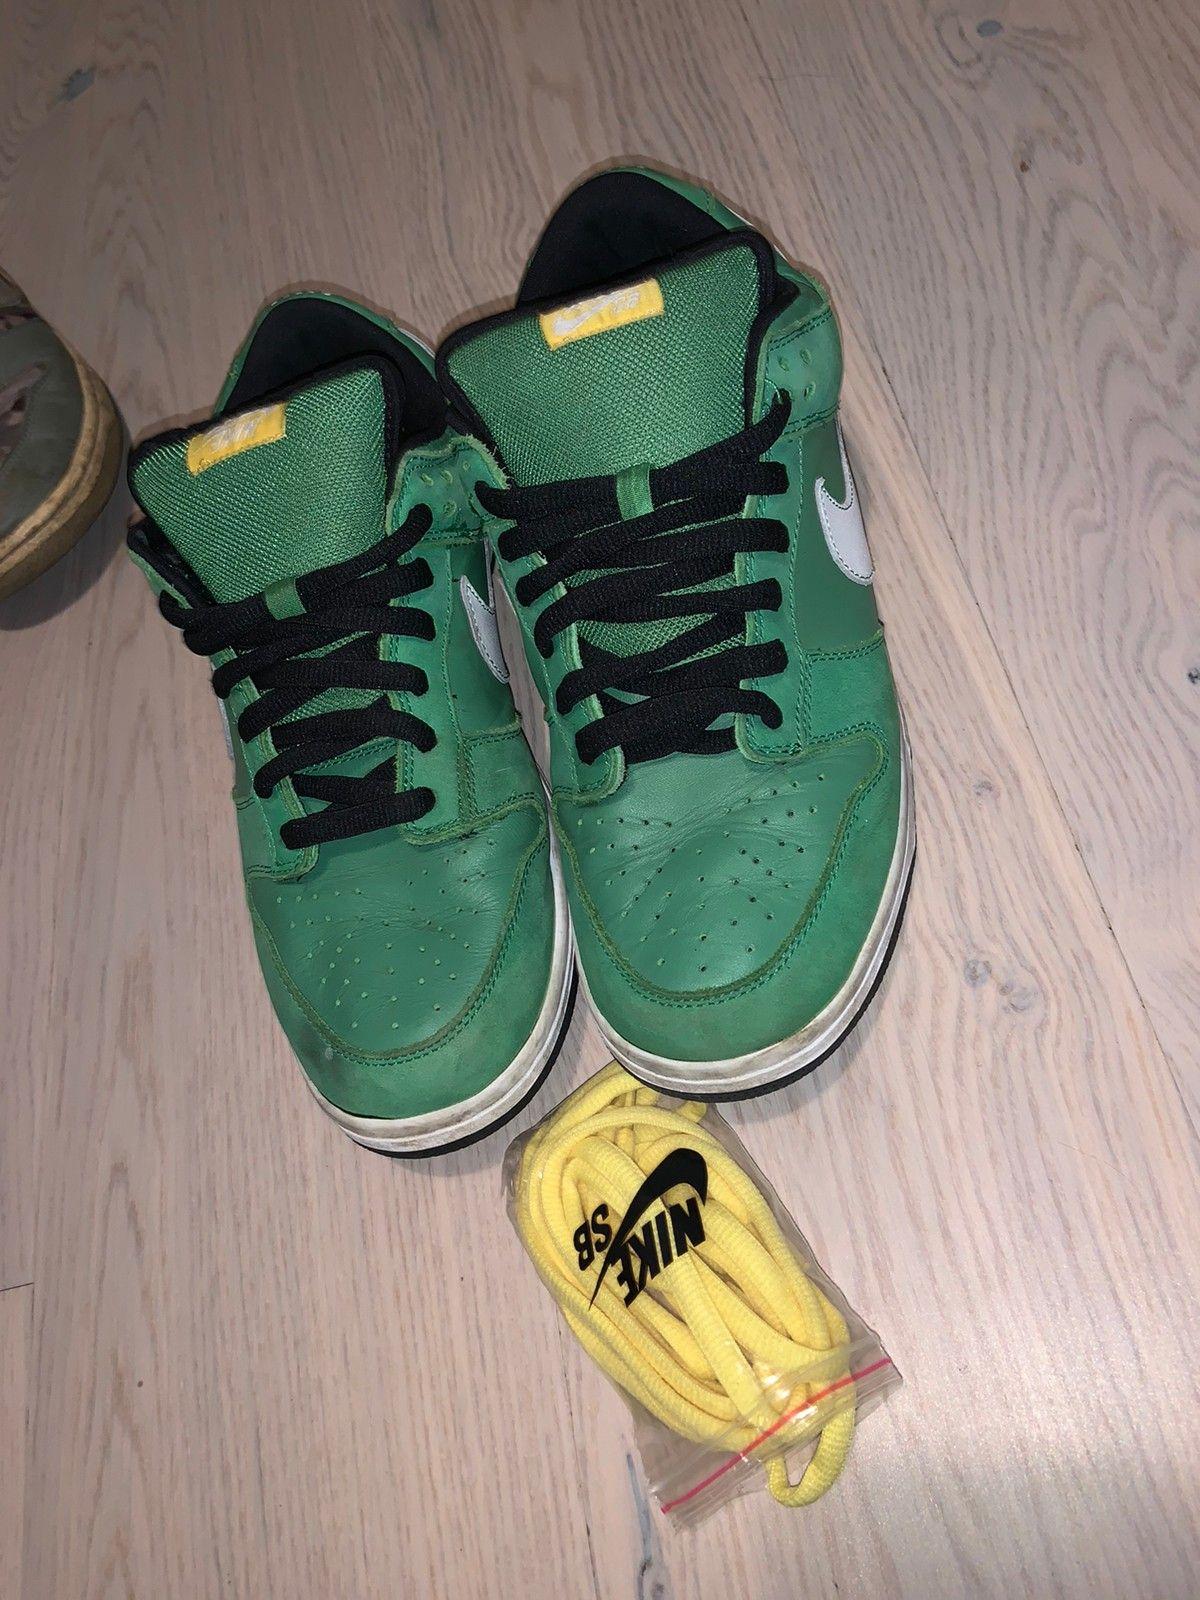 Nike Dunk SB Low Tokyo Green Taxi   FINN.no